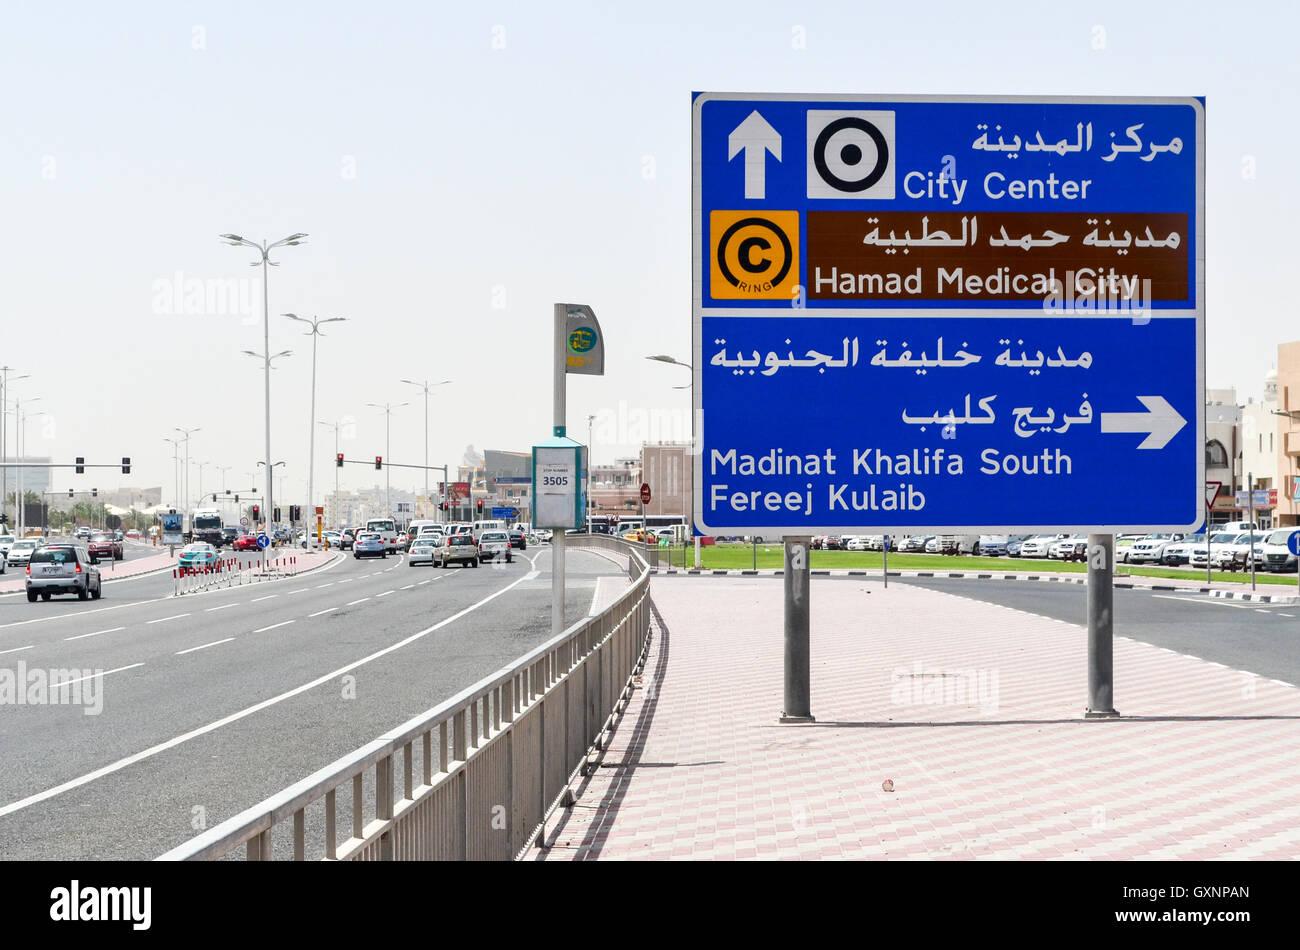 Roads of Doha, Qatar - Stock Image